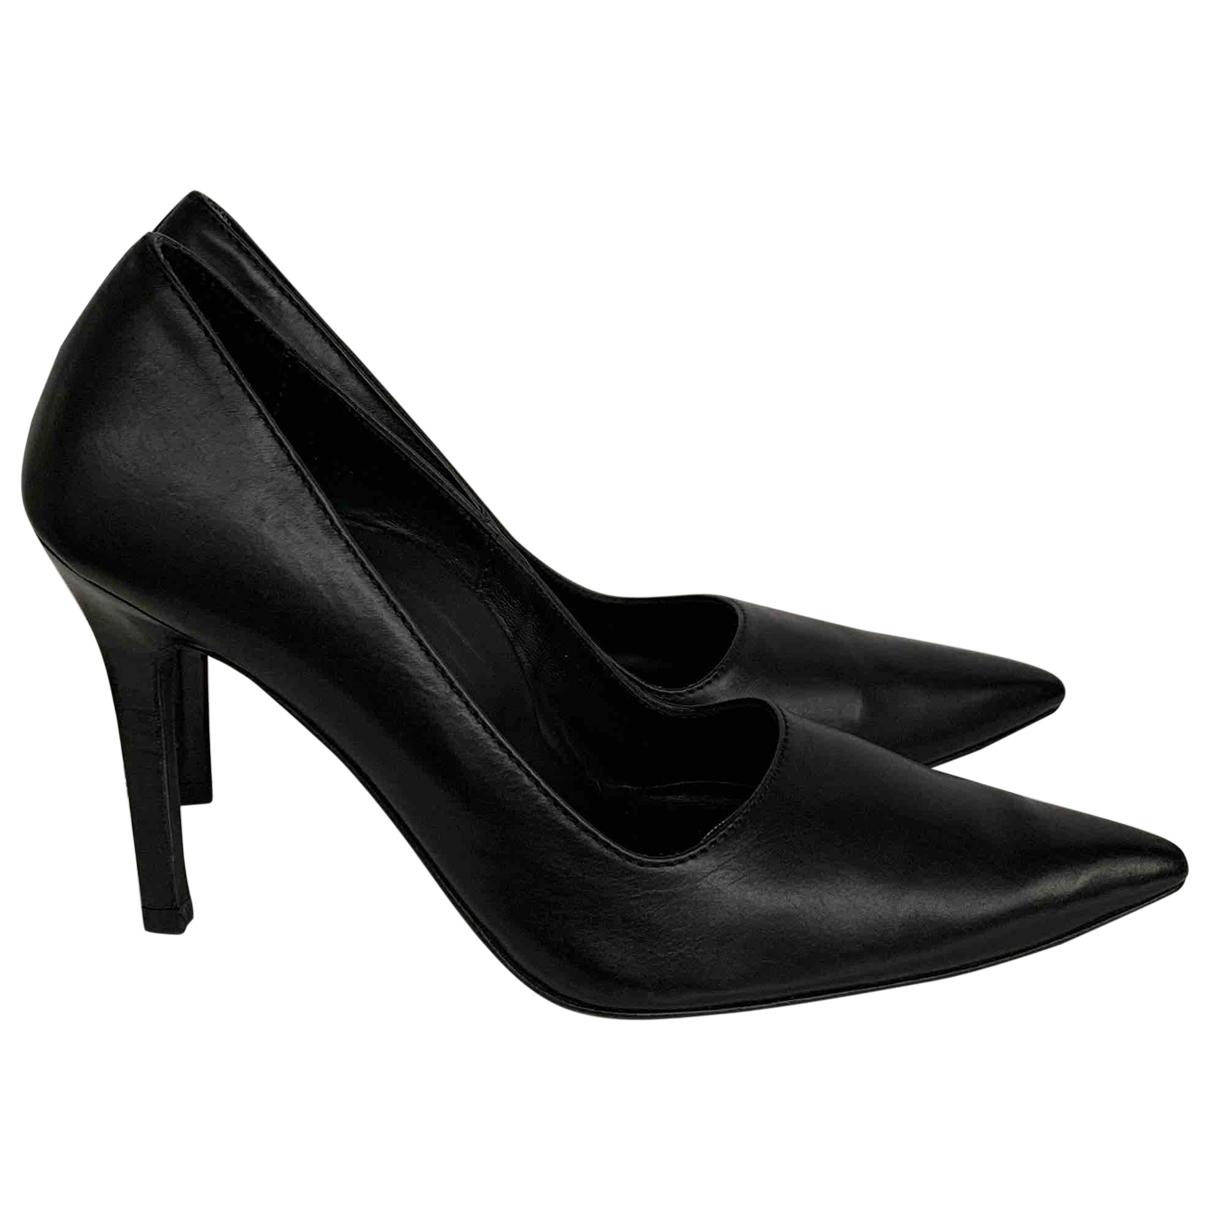 Ann Demeulemeester - Sabots   pour femme en cuir - noir